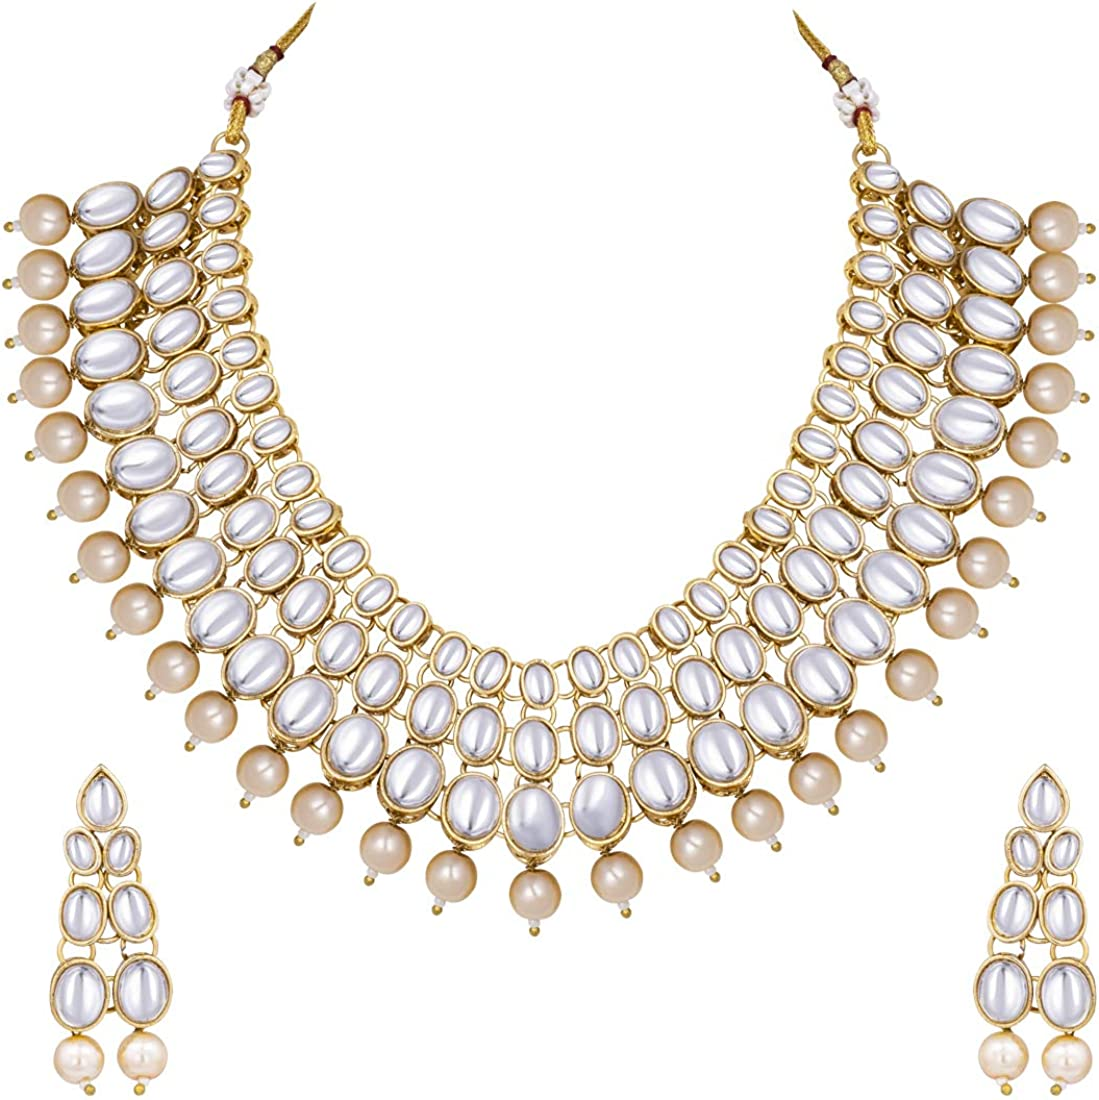 Aheli Faux Kundan Pearl Necklace with Earring Maang Tikka Indian ...